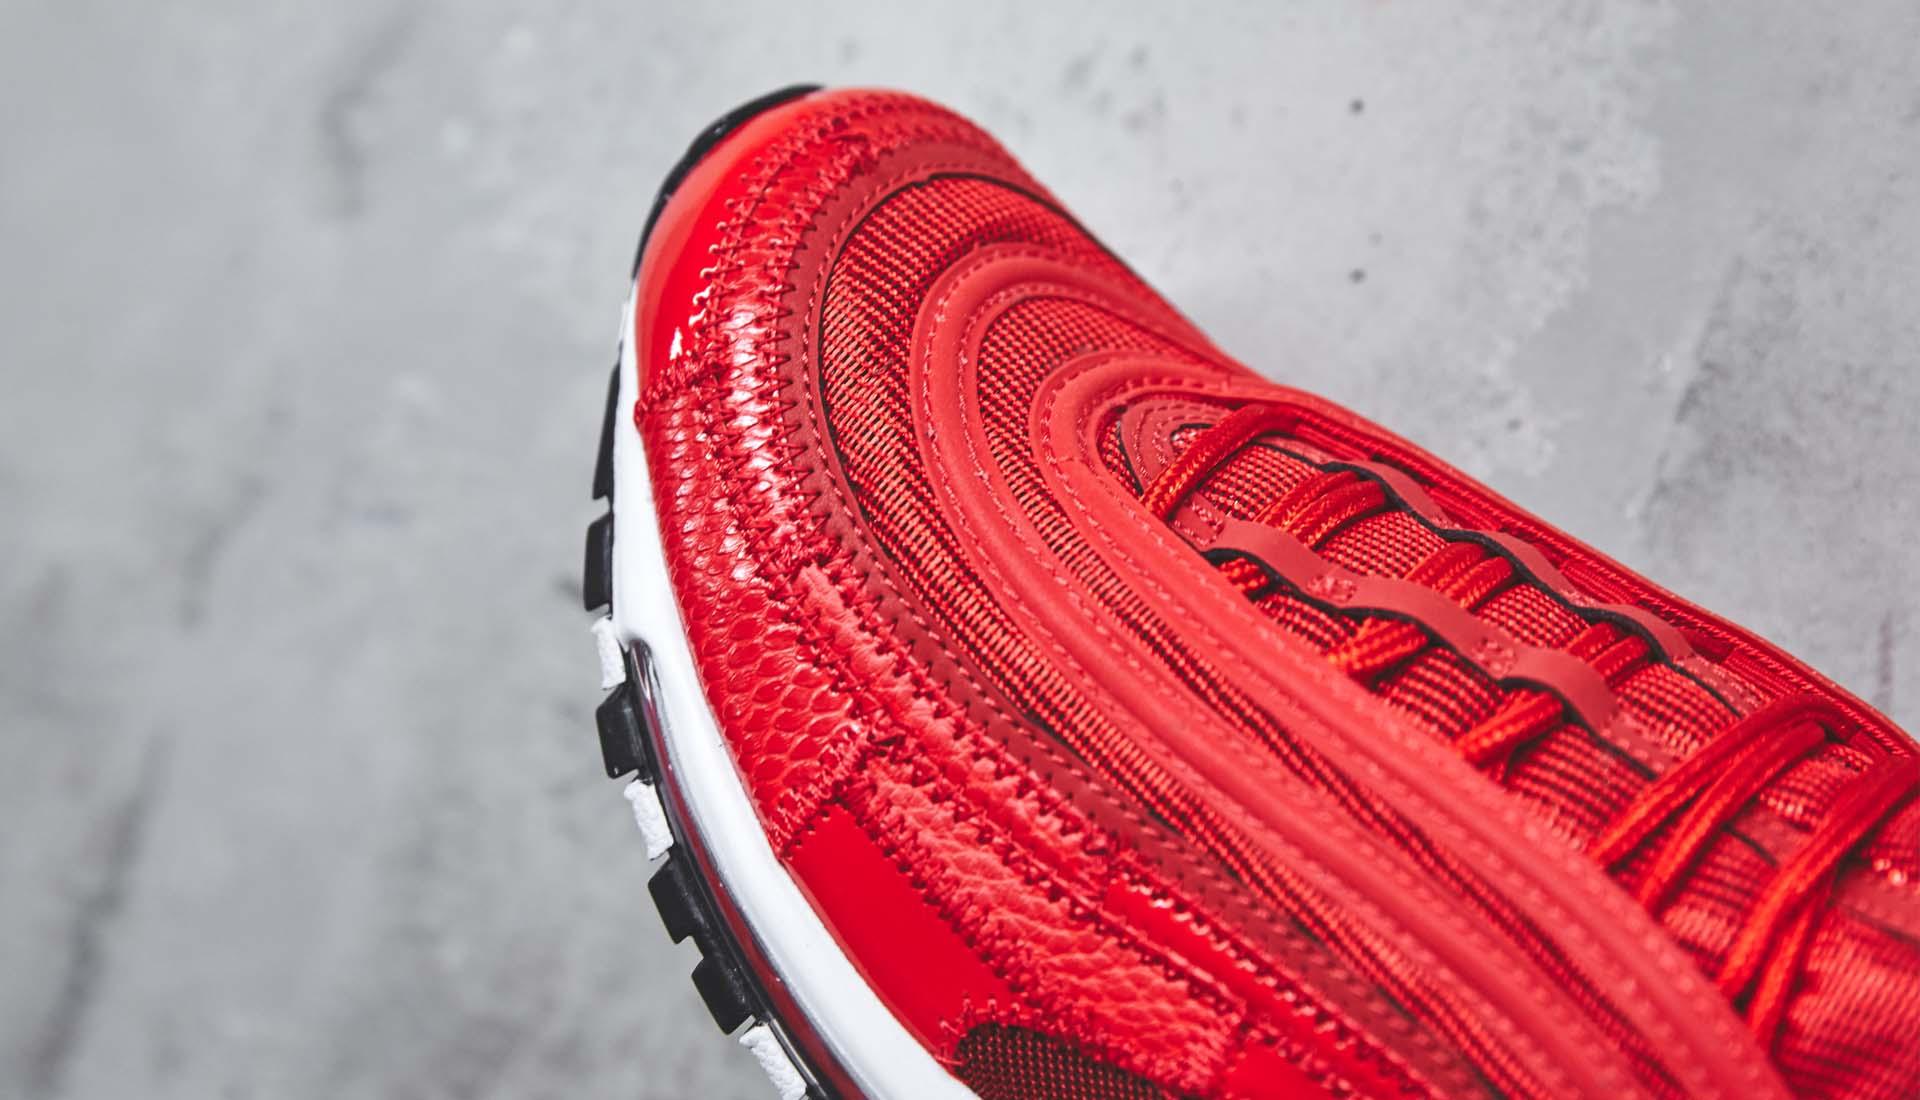 A Closer Look At The Nike Air Max 97 CR7 - SoccerBible 2c9cdab35